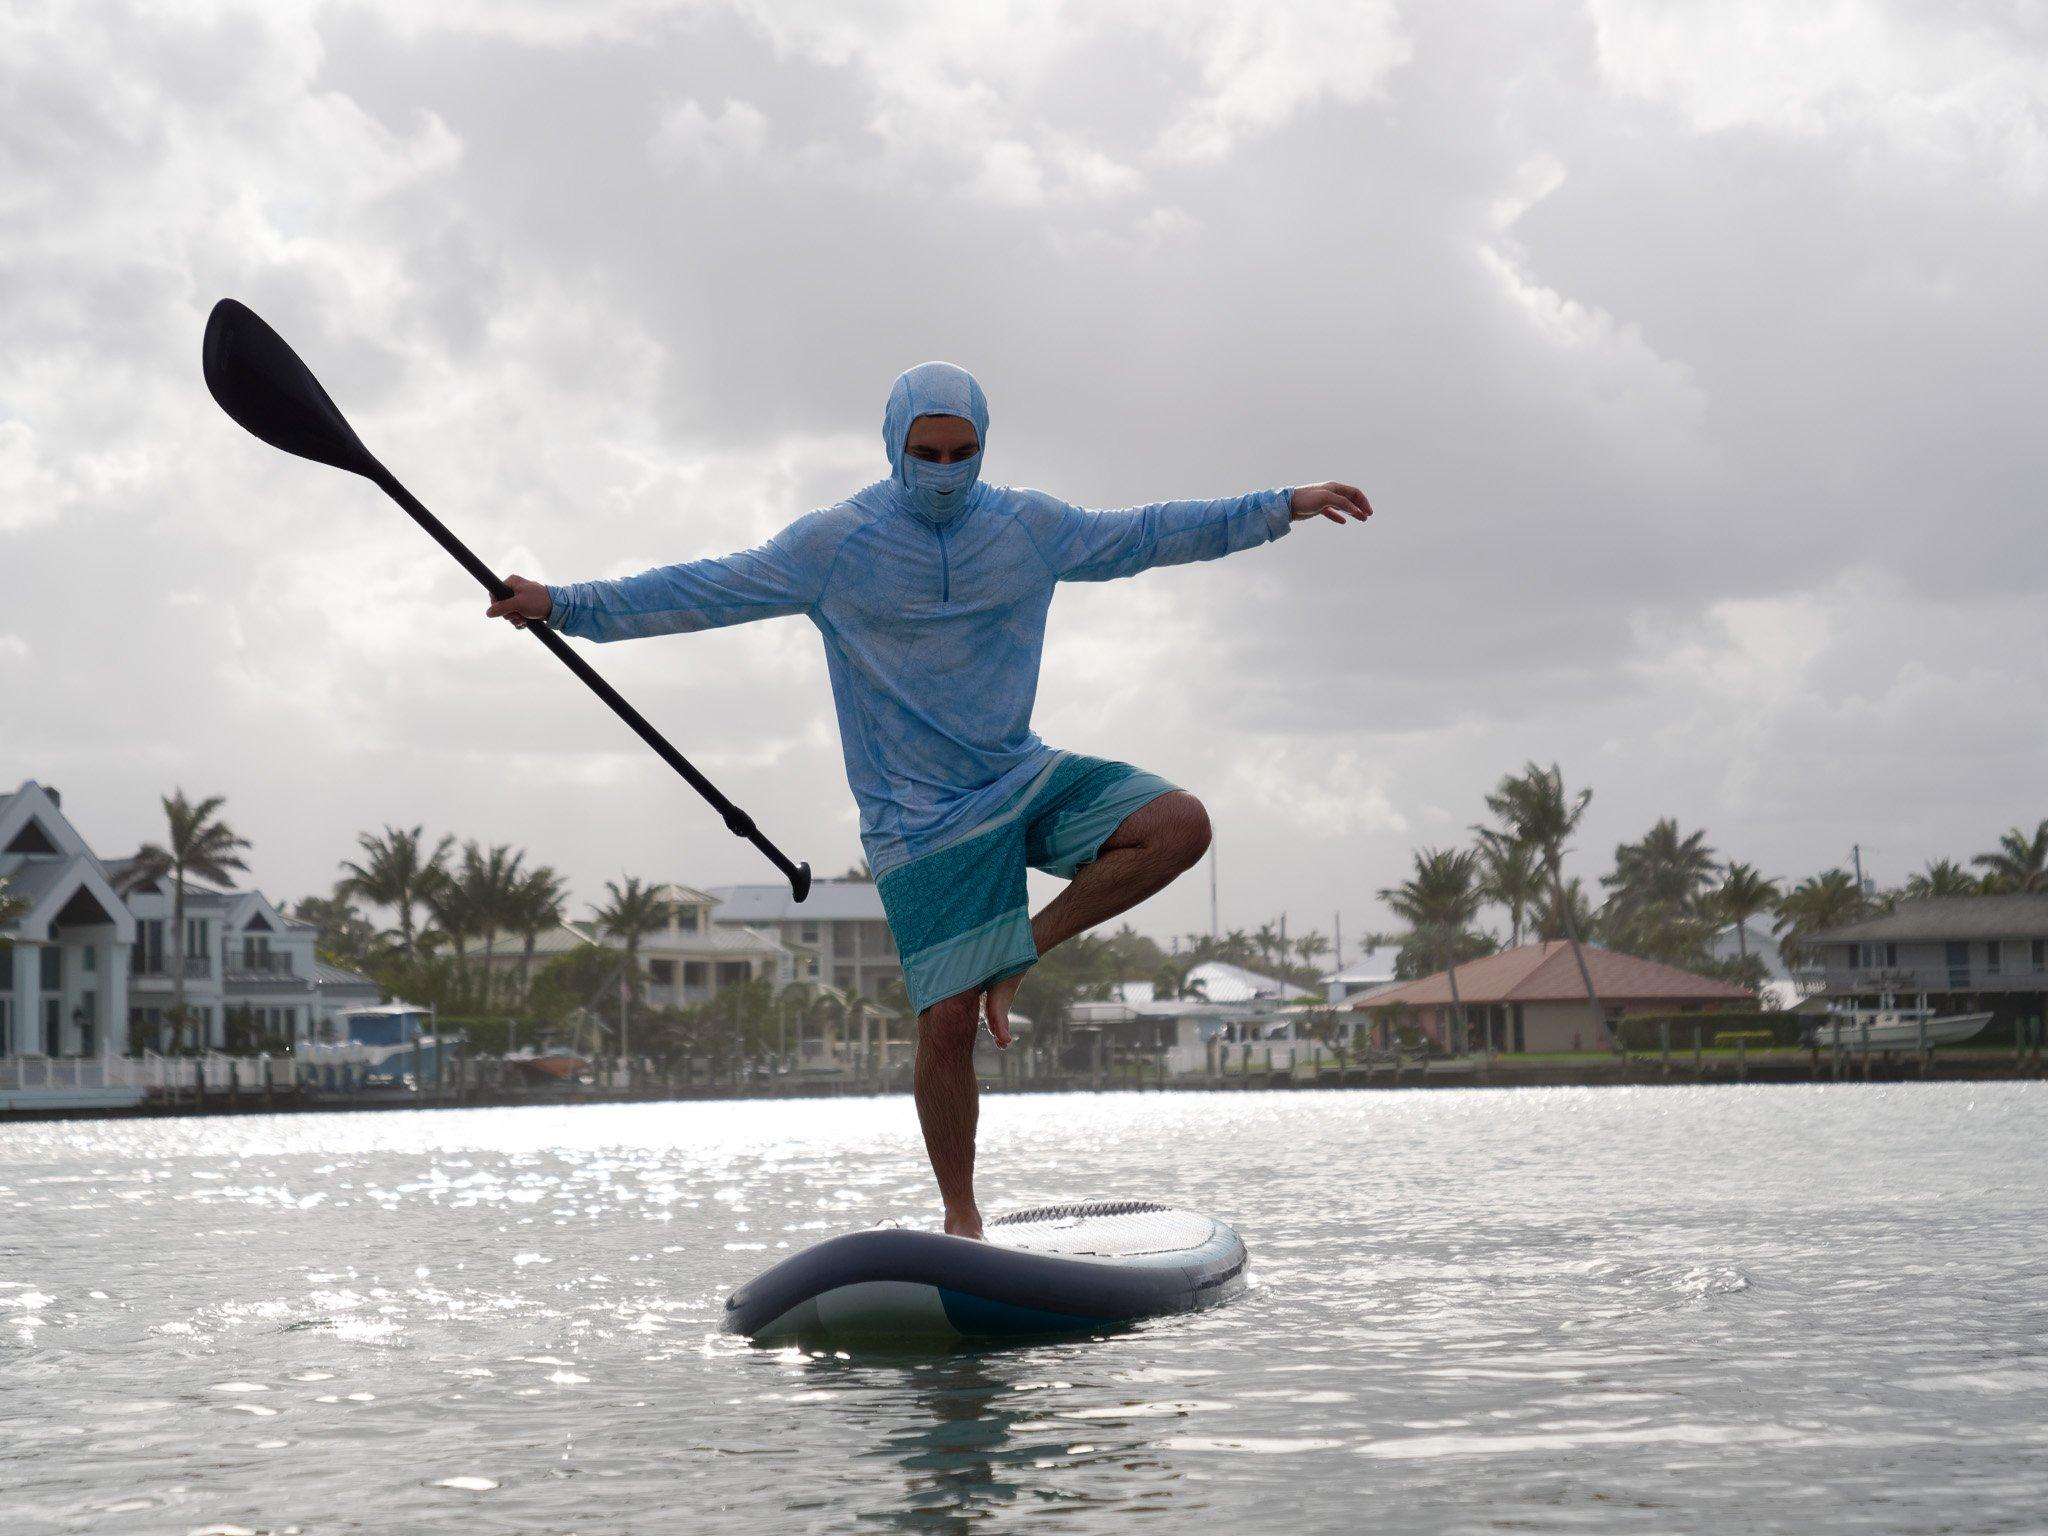 "SUP Ninja showing balance on a 5"" SUP board"